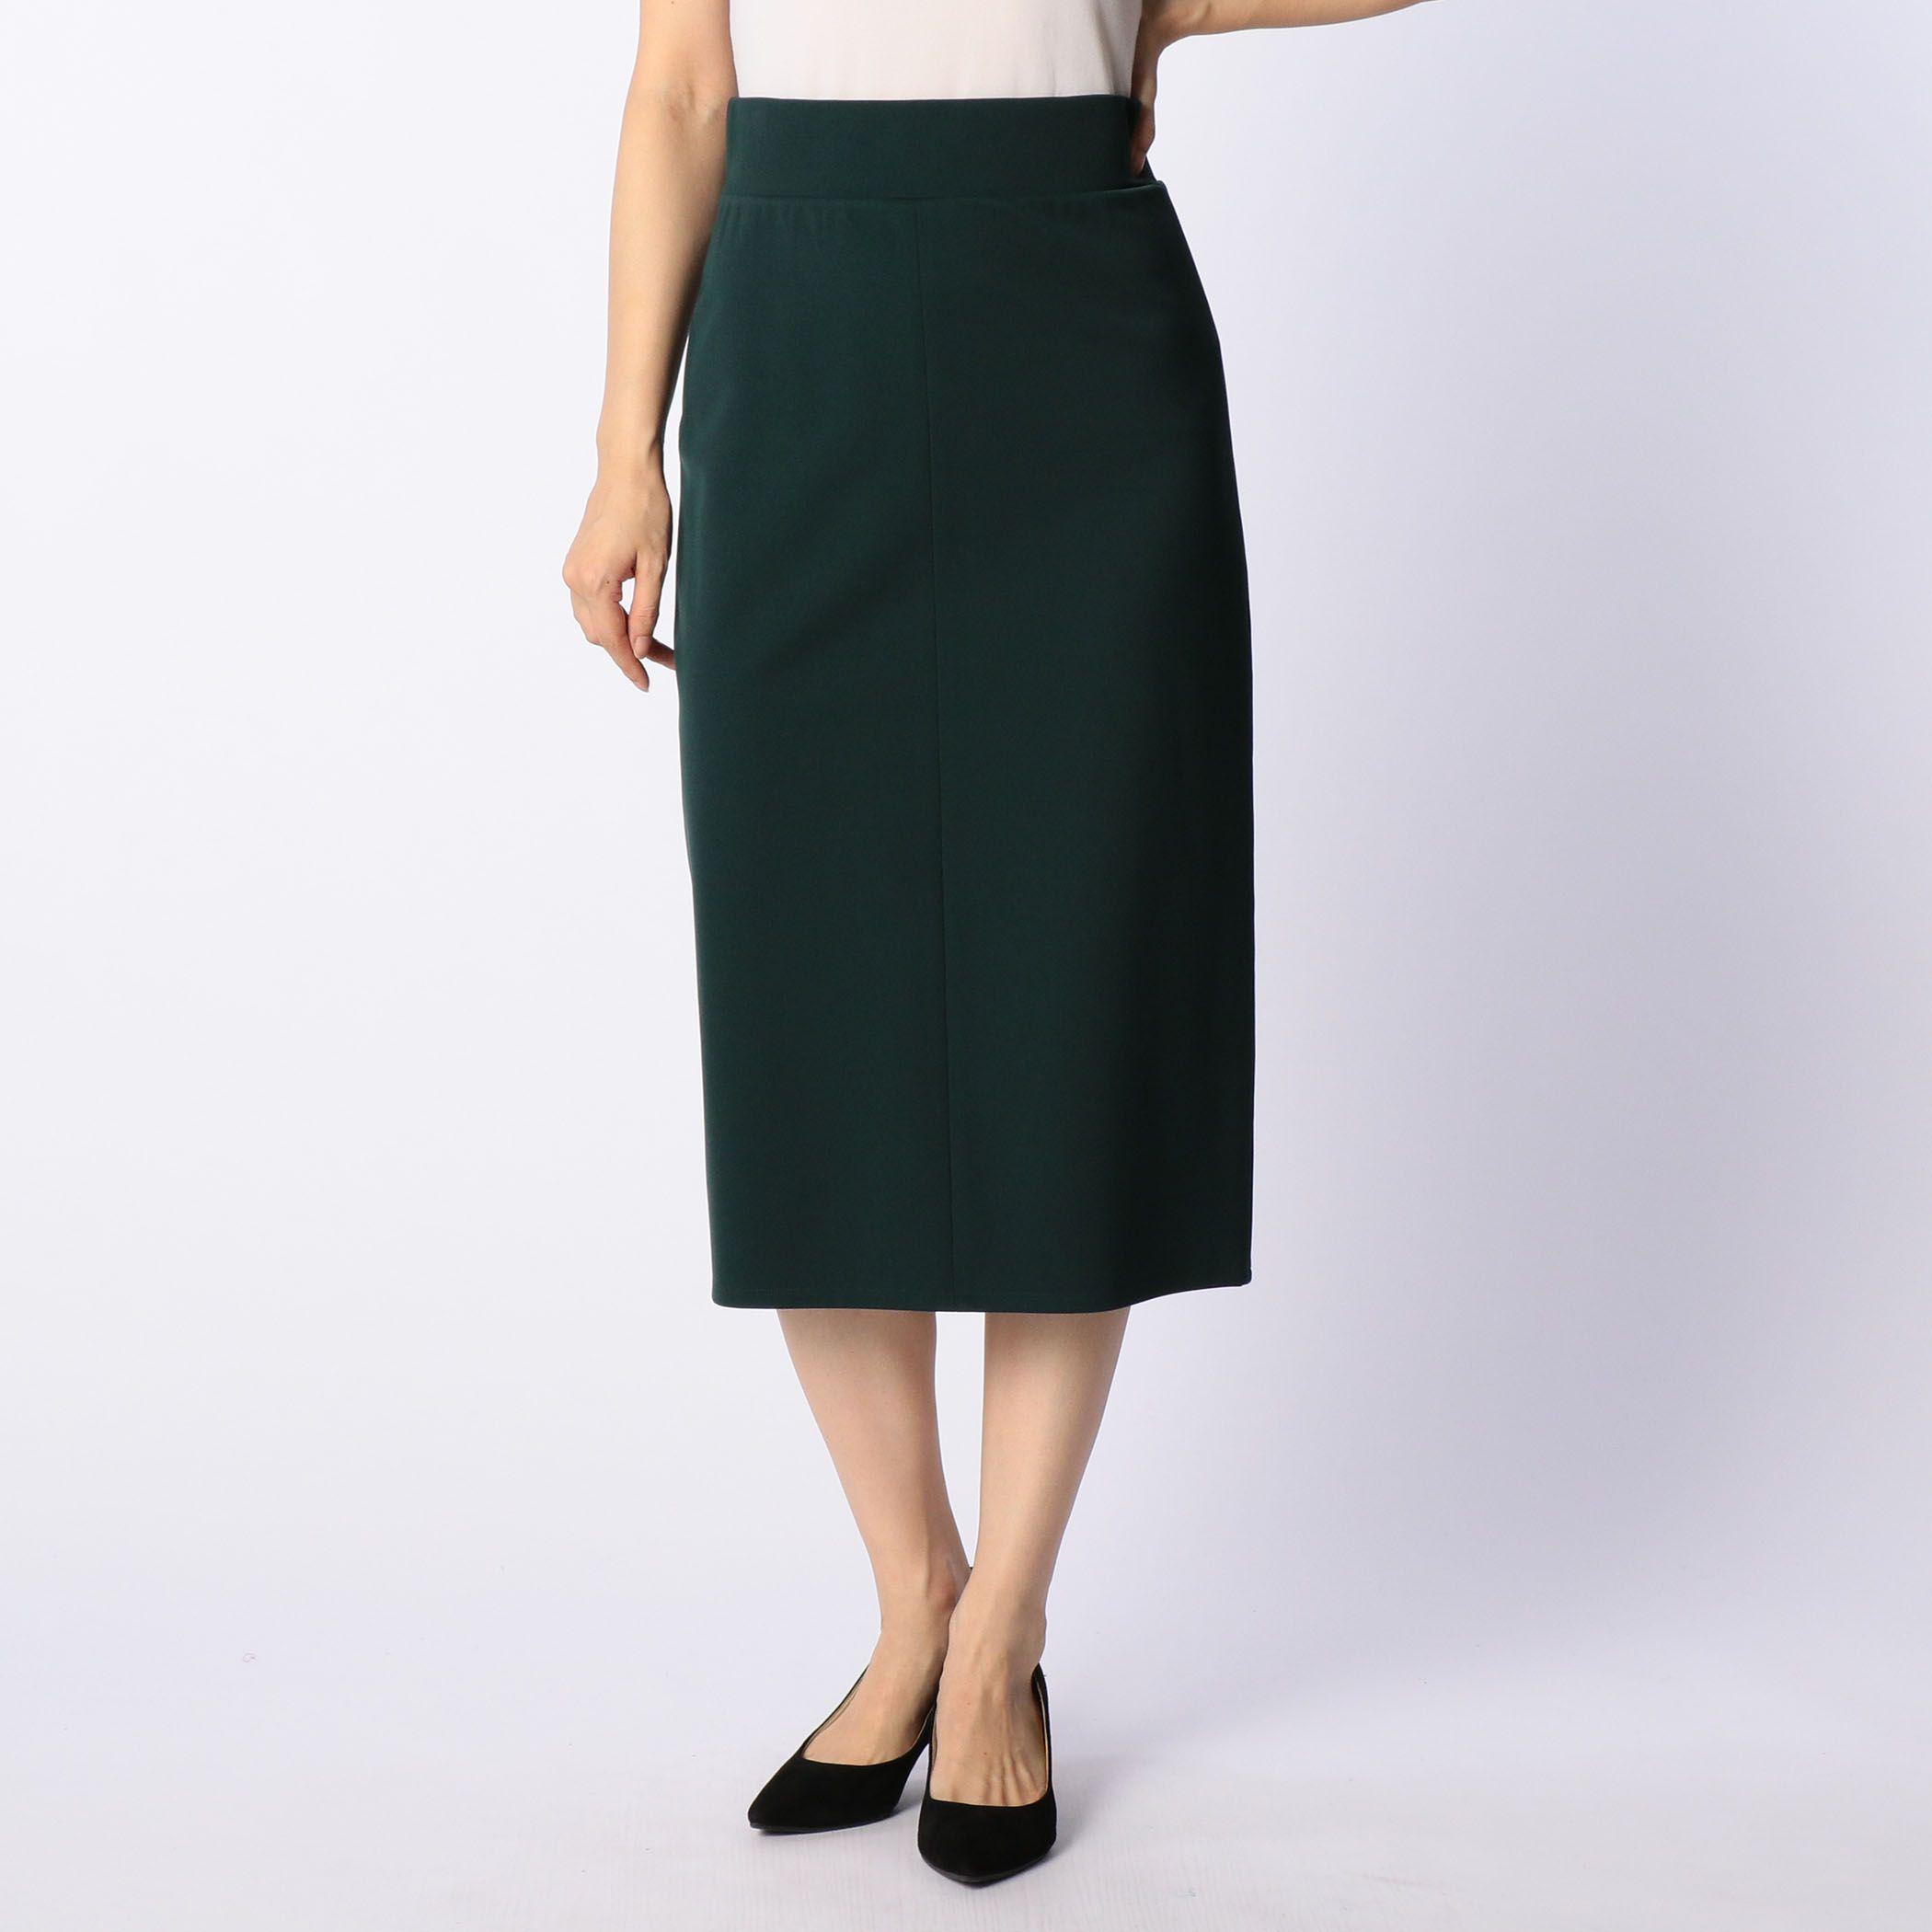 NOLLEY'Ssophiノーリーズソフィー/ツイルインゴムタイトスカート